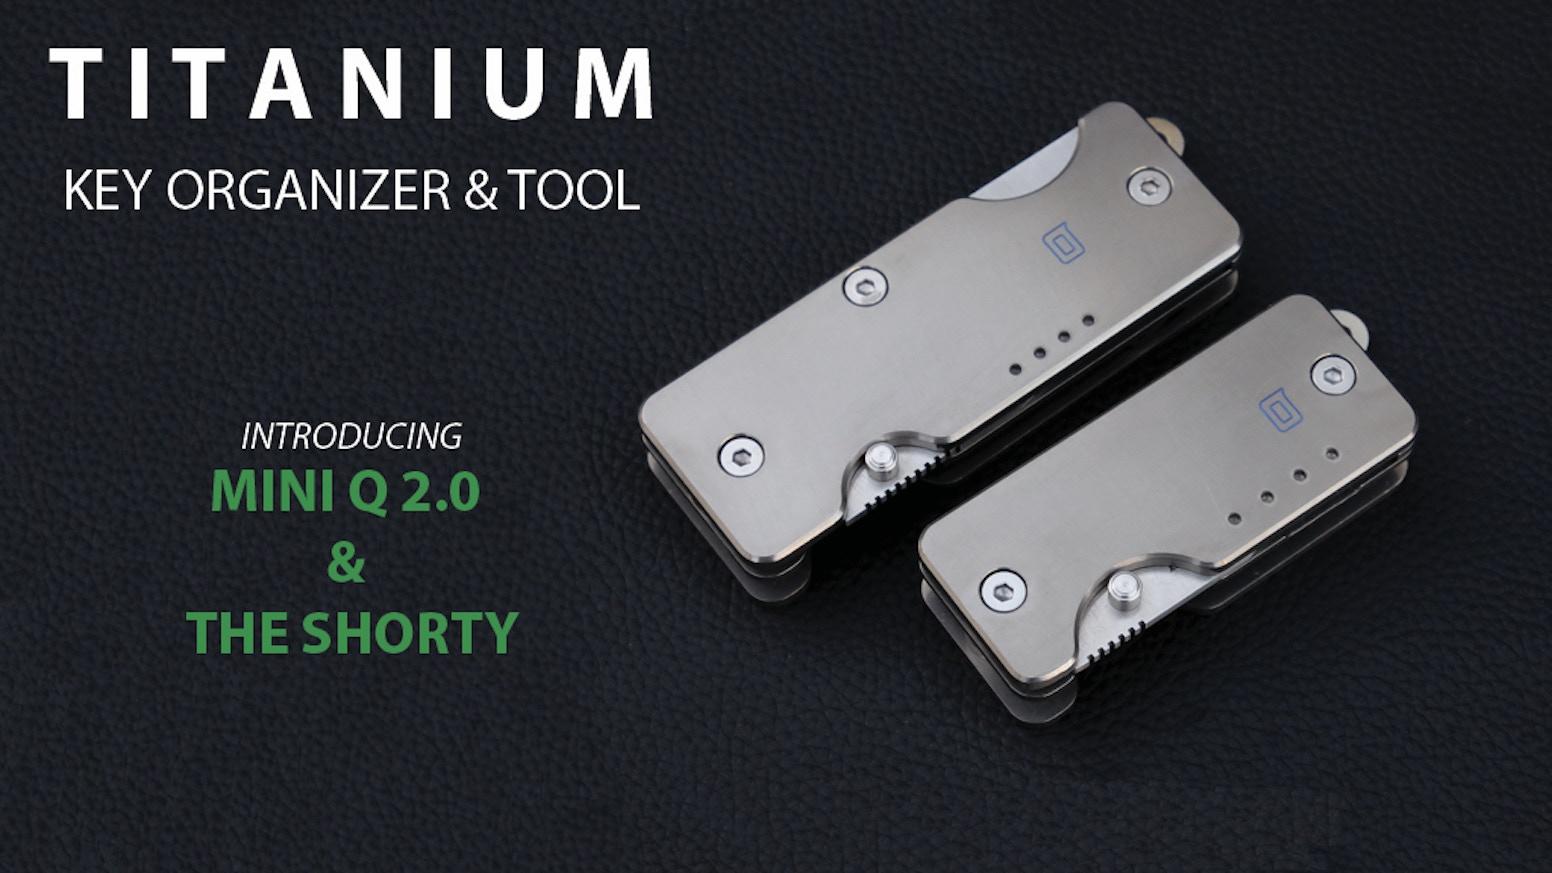 Titanium Key Organizer & Knife for your Everyday Carry!